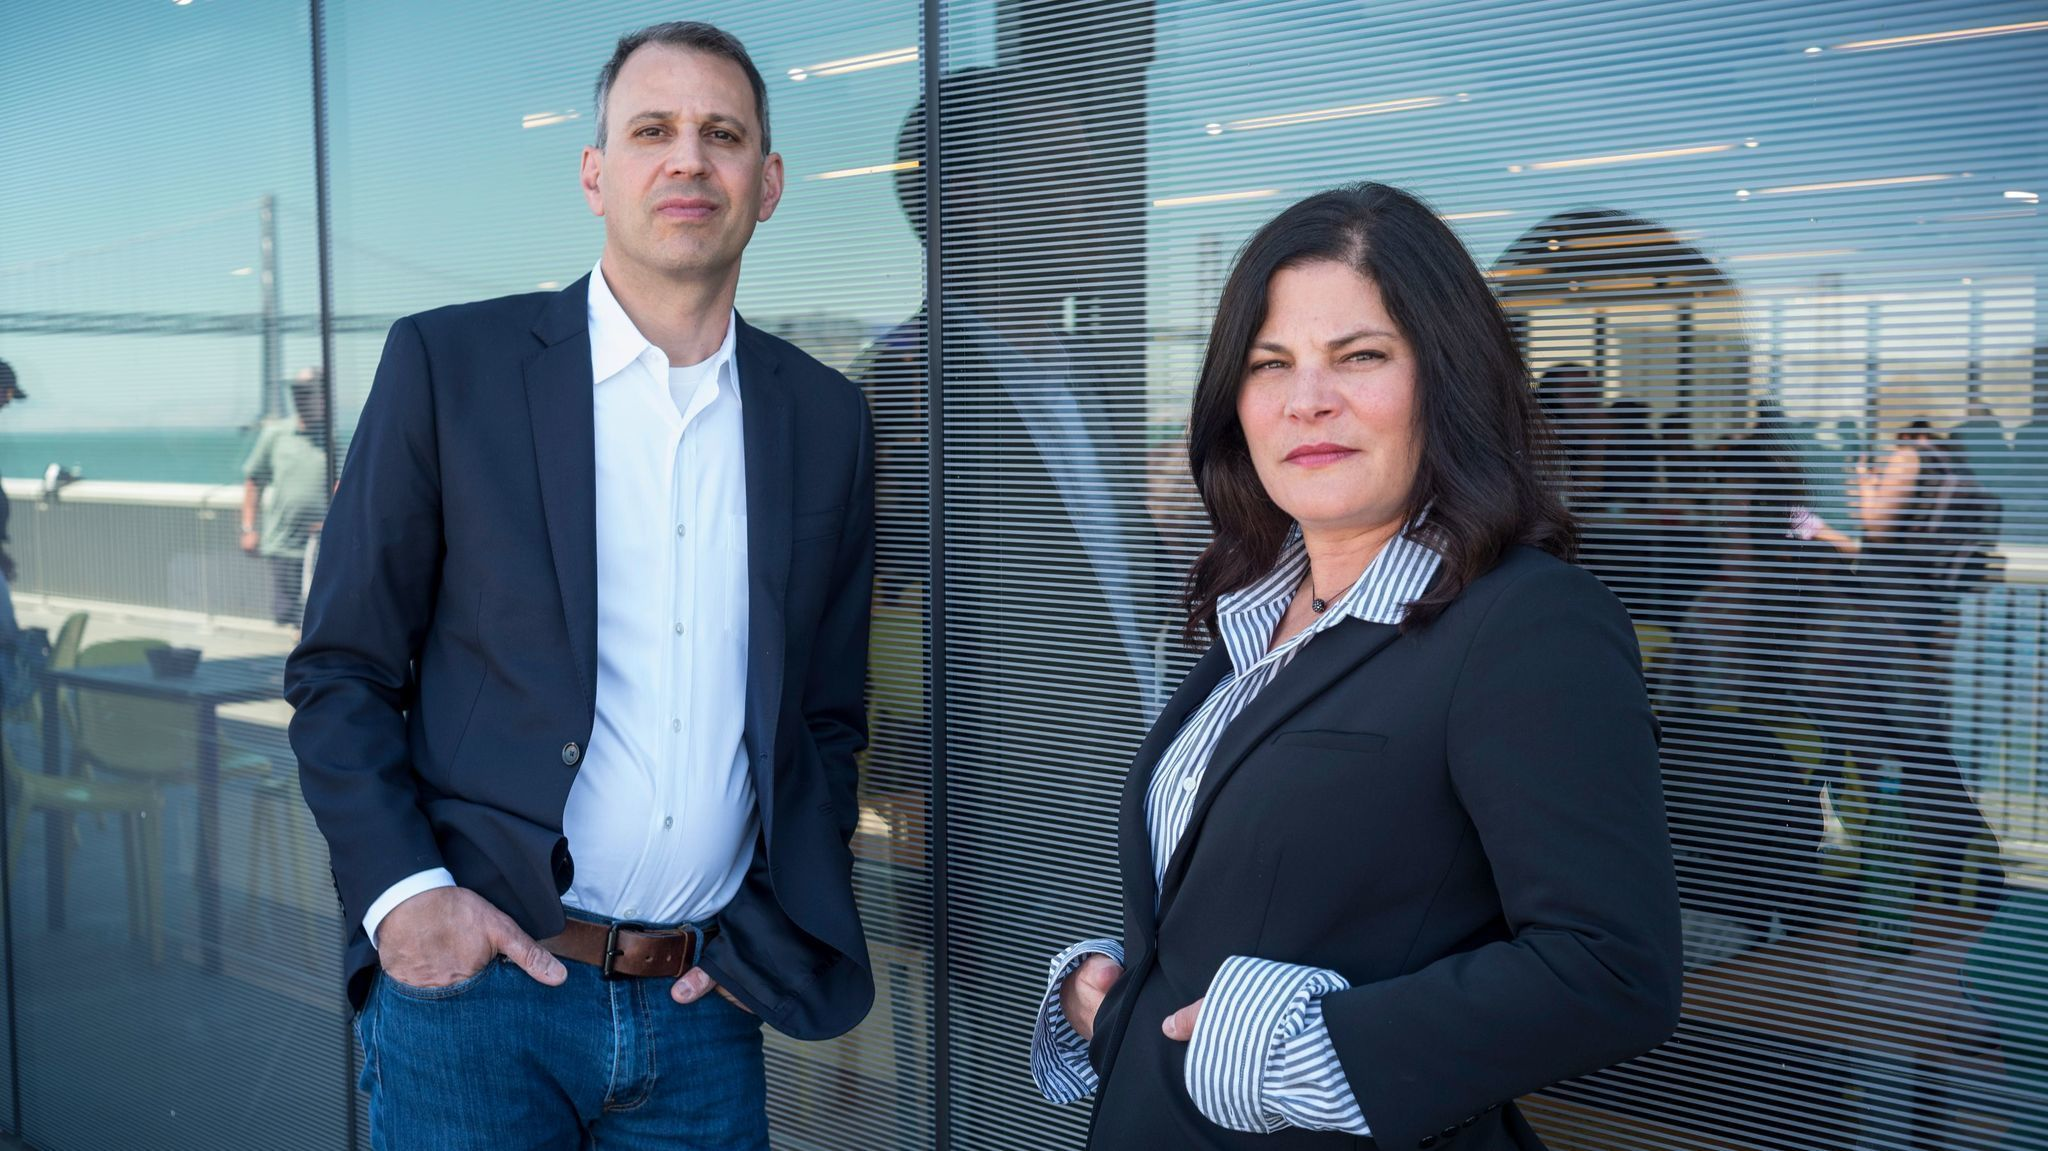 'Inconvenient Sequel' directors Bonni Cohen and Jon Shenk bring hope to the climate crisis